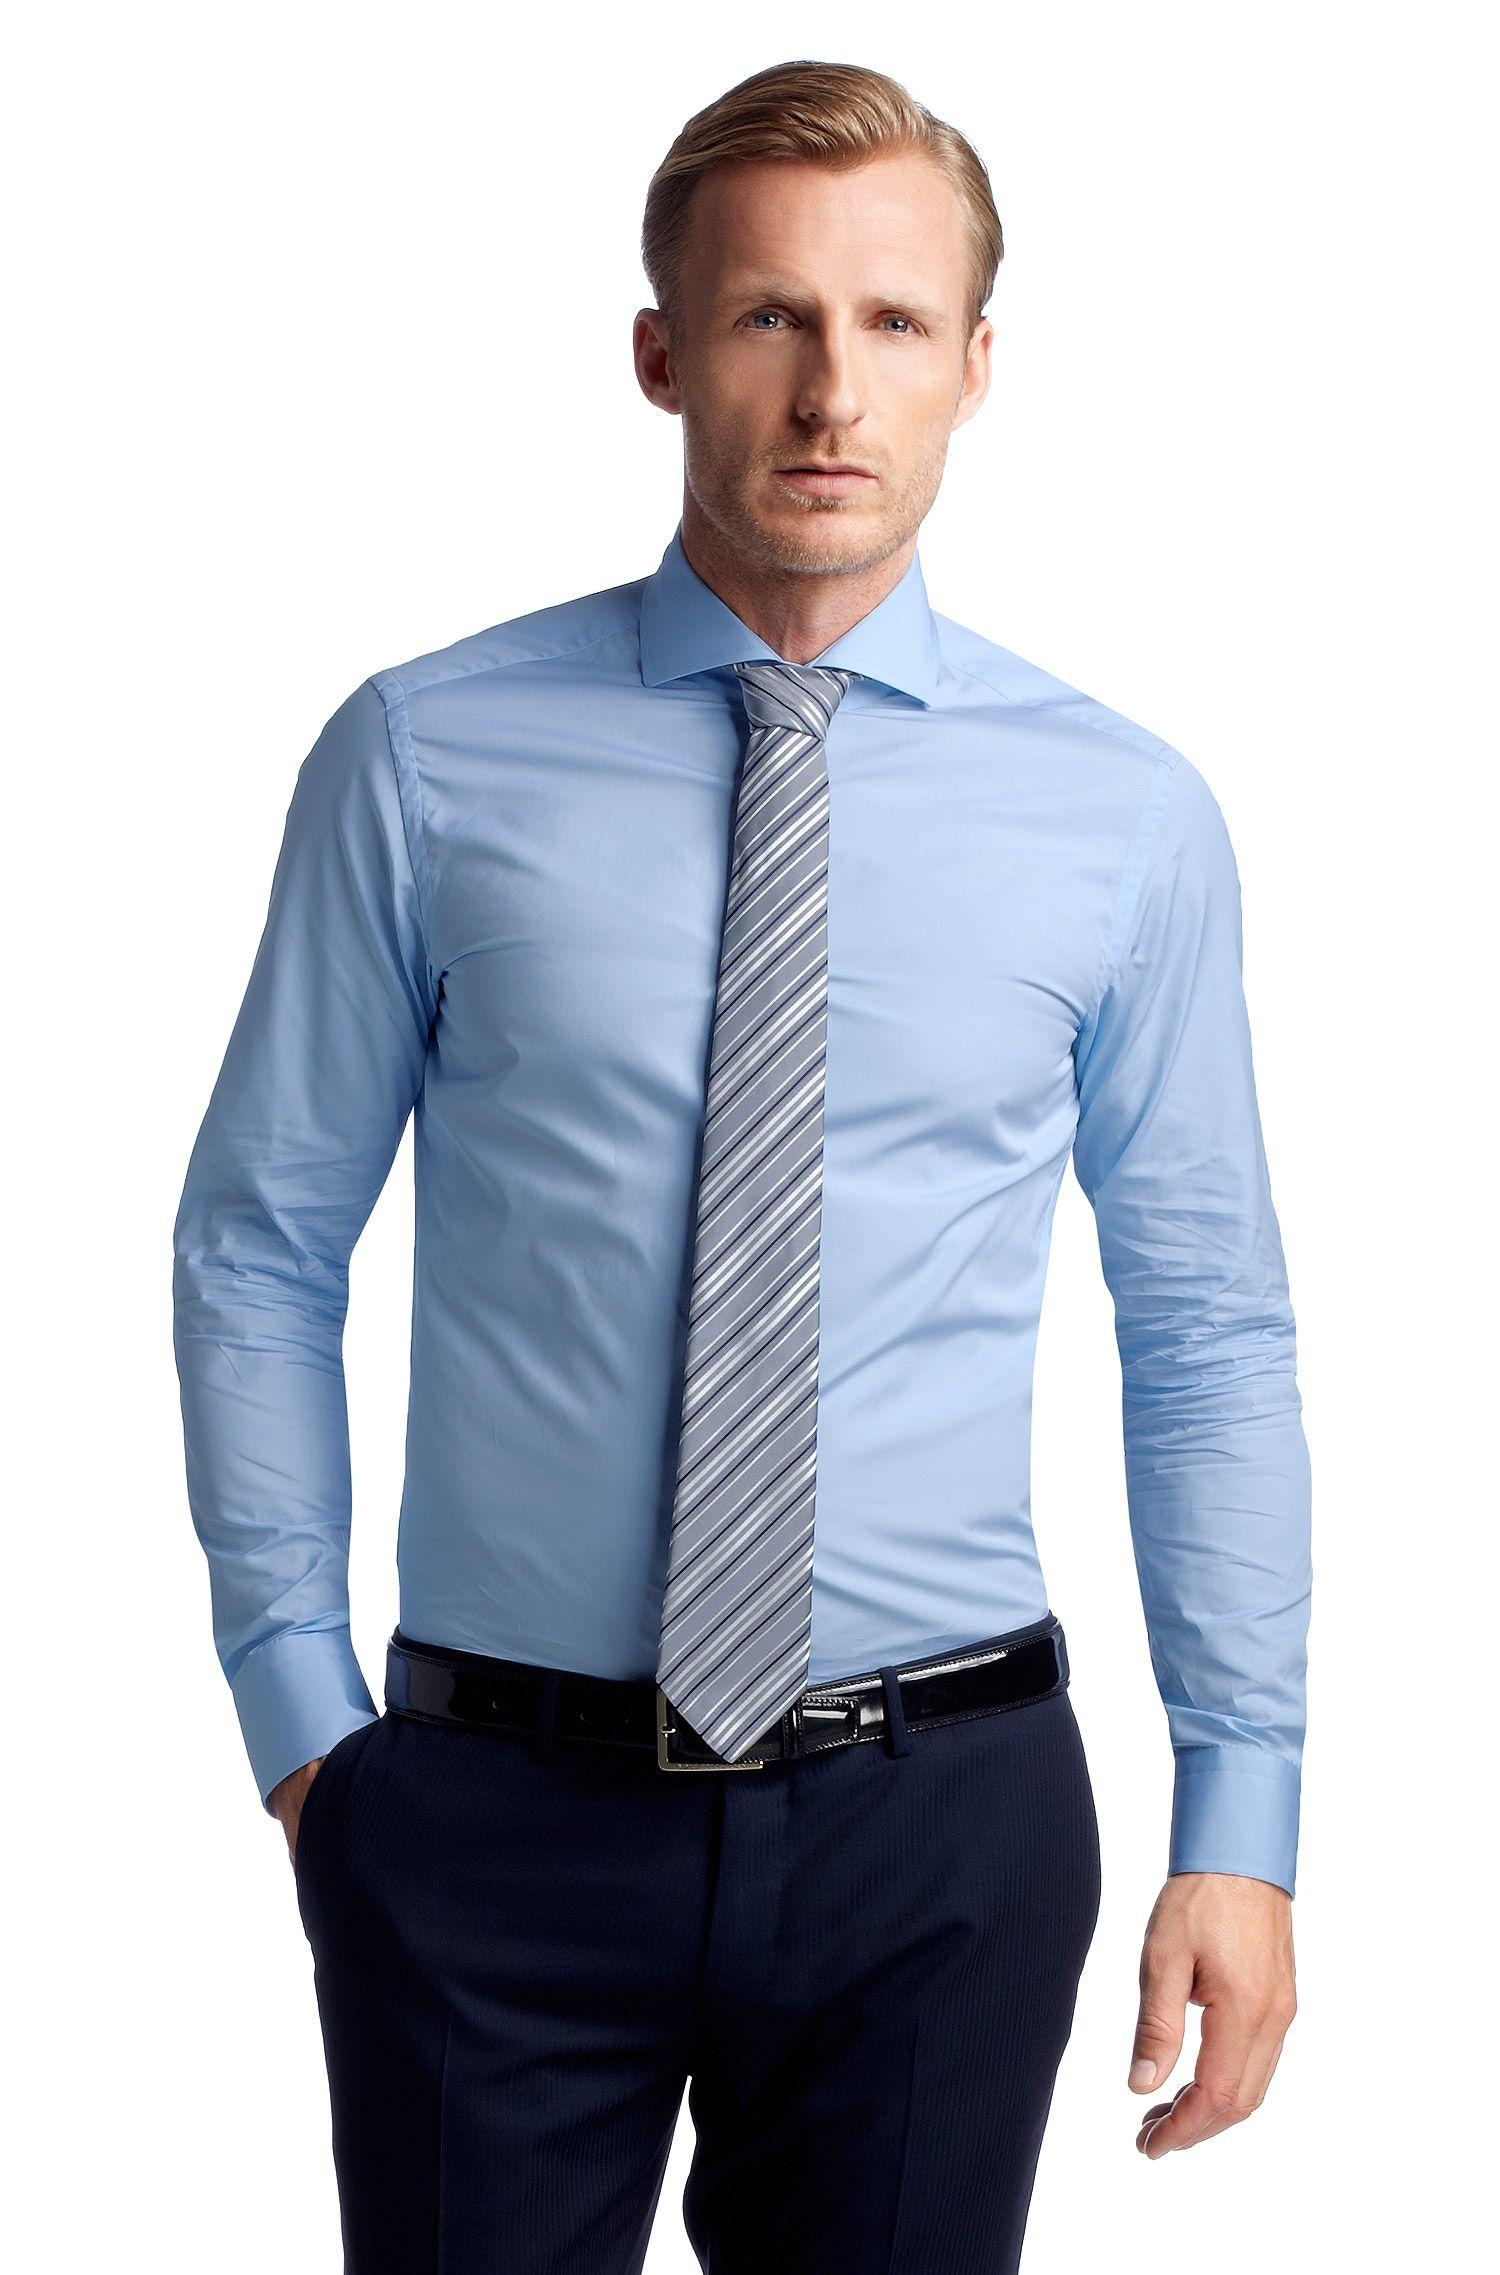 Business-overhemd ´Christo` met cutaway-kraag